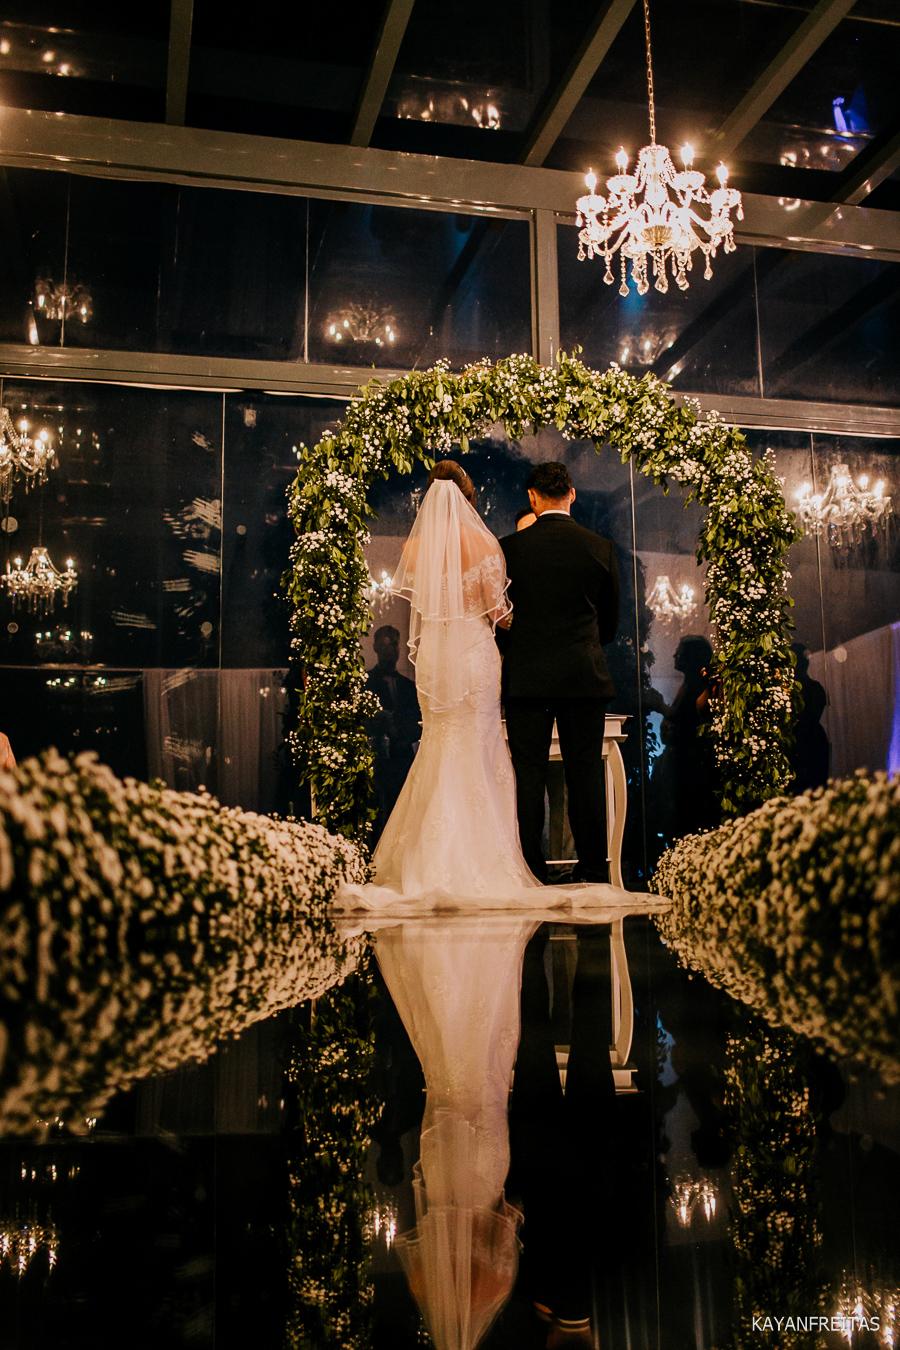 casamento-indaia-floripa-0053 Casamento Indaiá Florianópolis - Deise e Dário